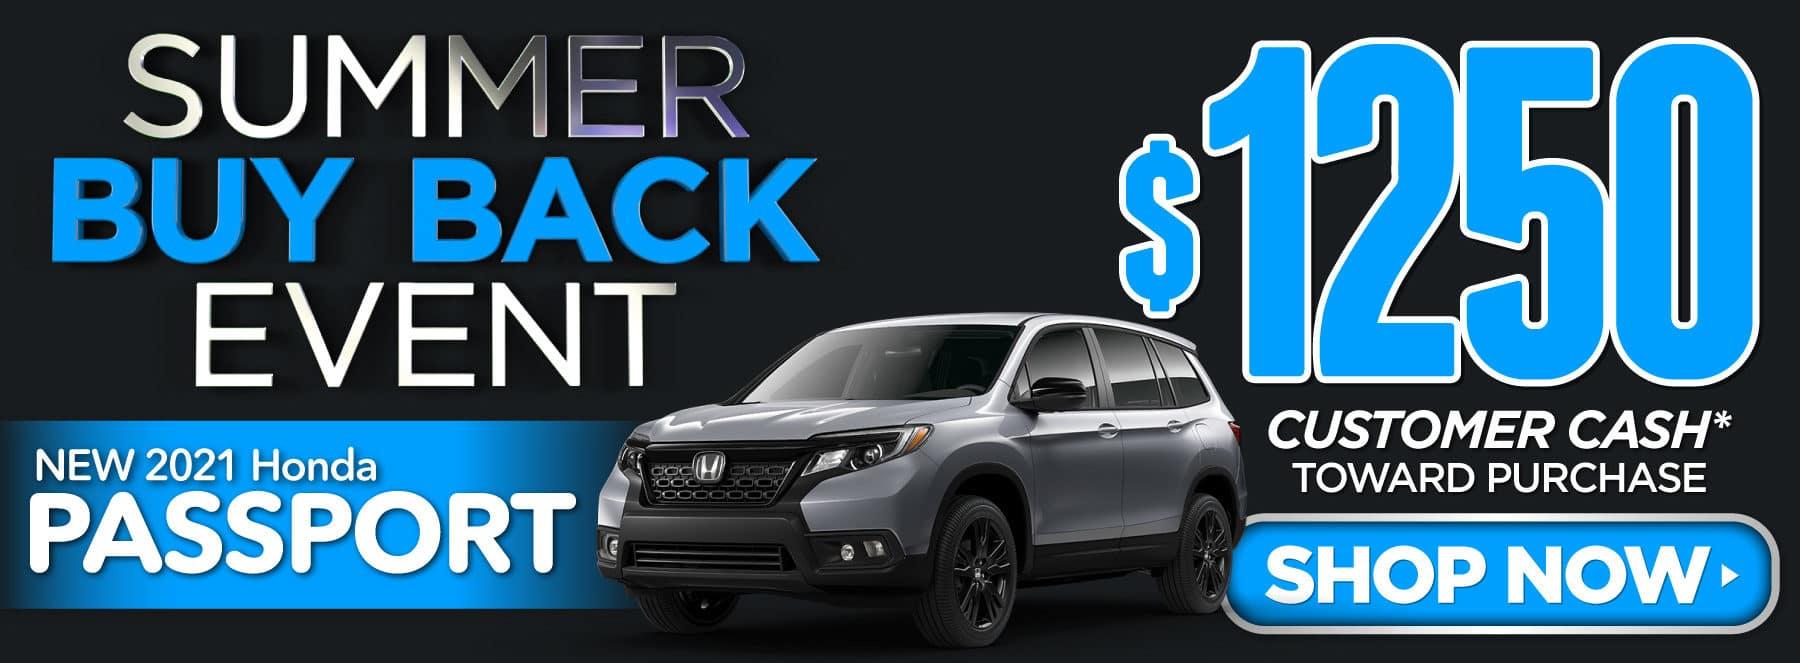 New 2021 Honda Passport - $1250 Customer Cash - Shop Now